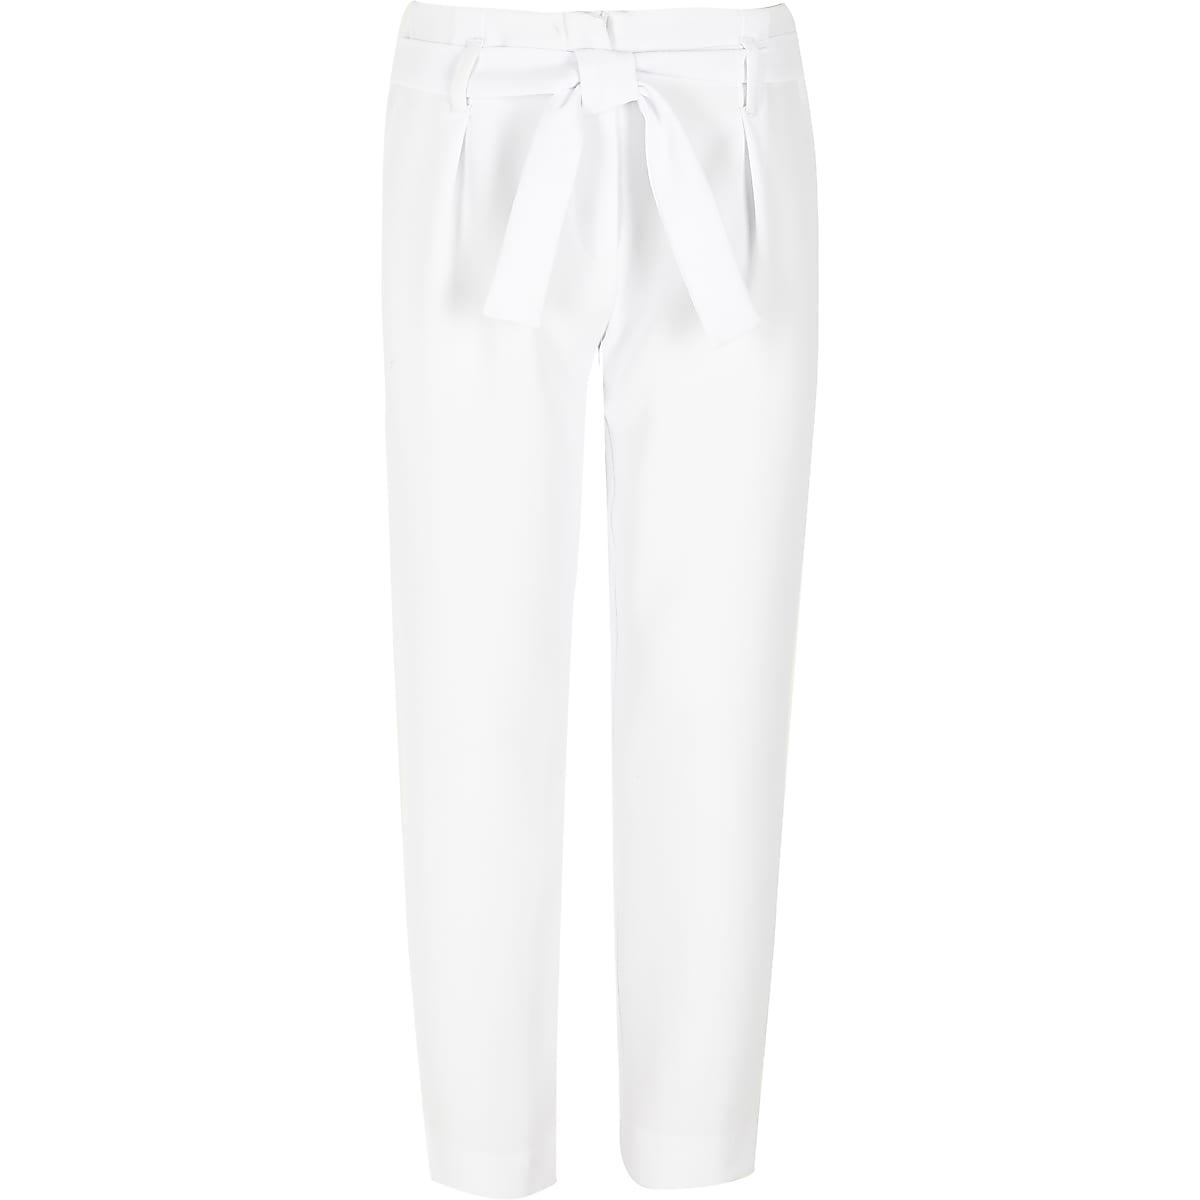 Girls white tie waist tapered trousers